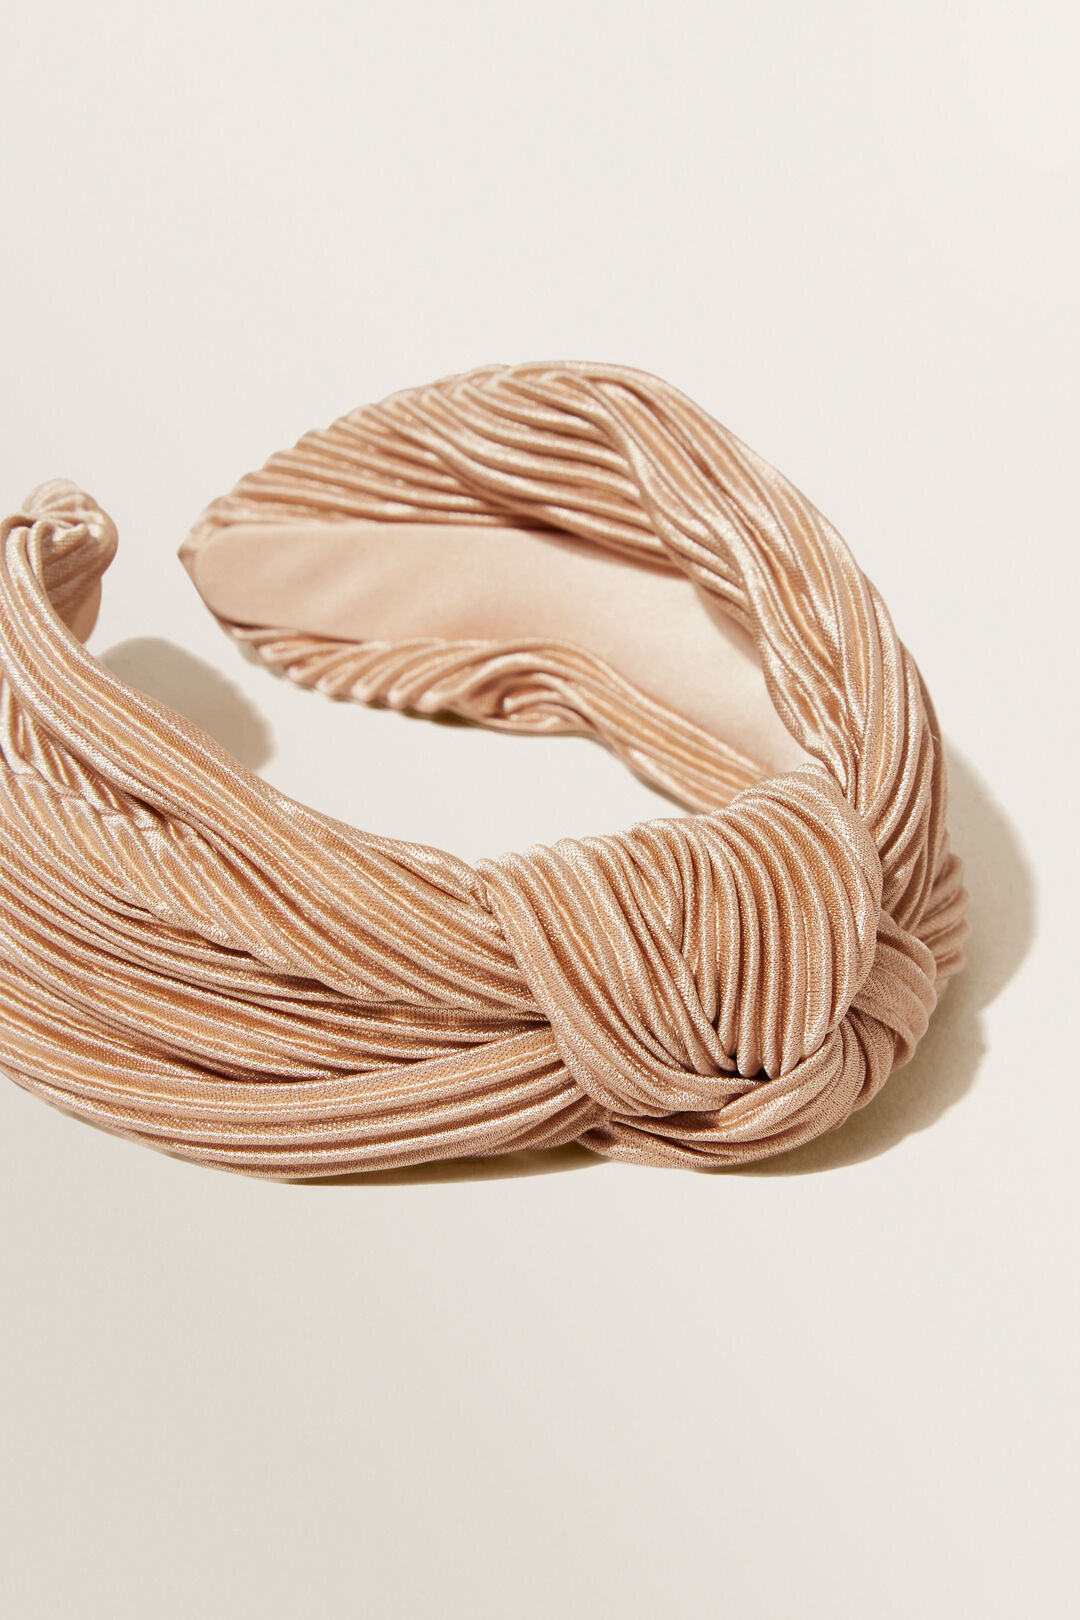 Knotted Pleat Headband  BISCOTTI  hi-res